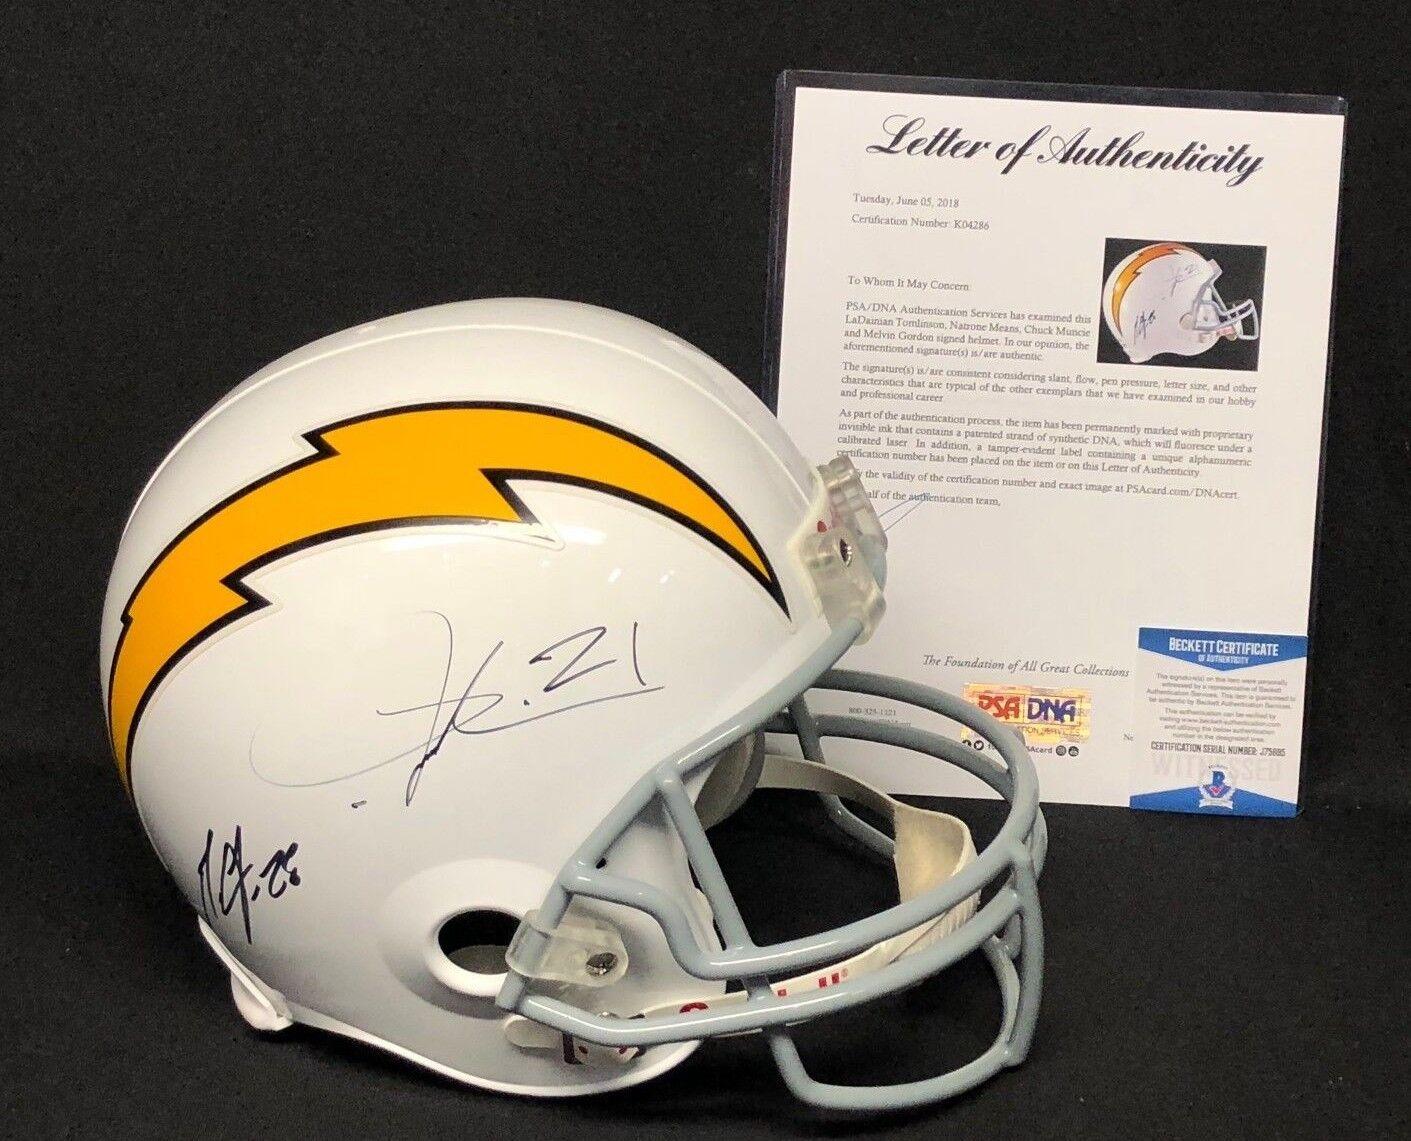 LaDainian Tomlinson Means Chuck Muncie Melvin Gordon Signed Chargers Helmet PSA